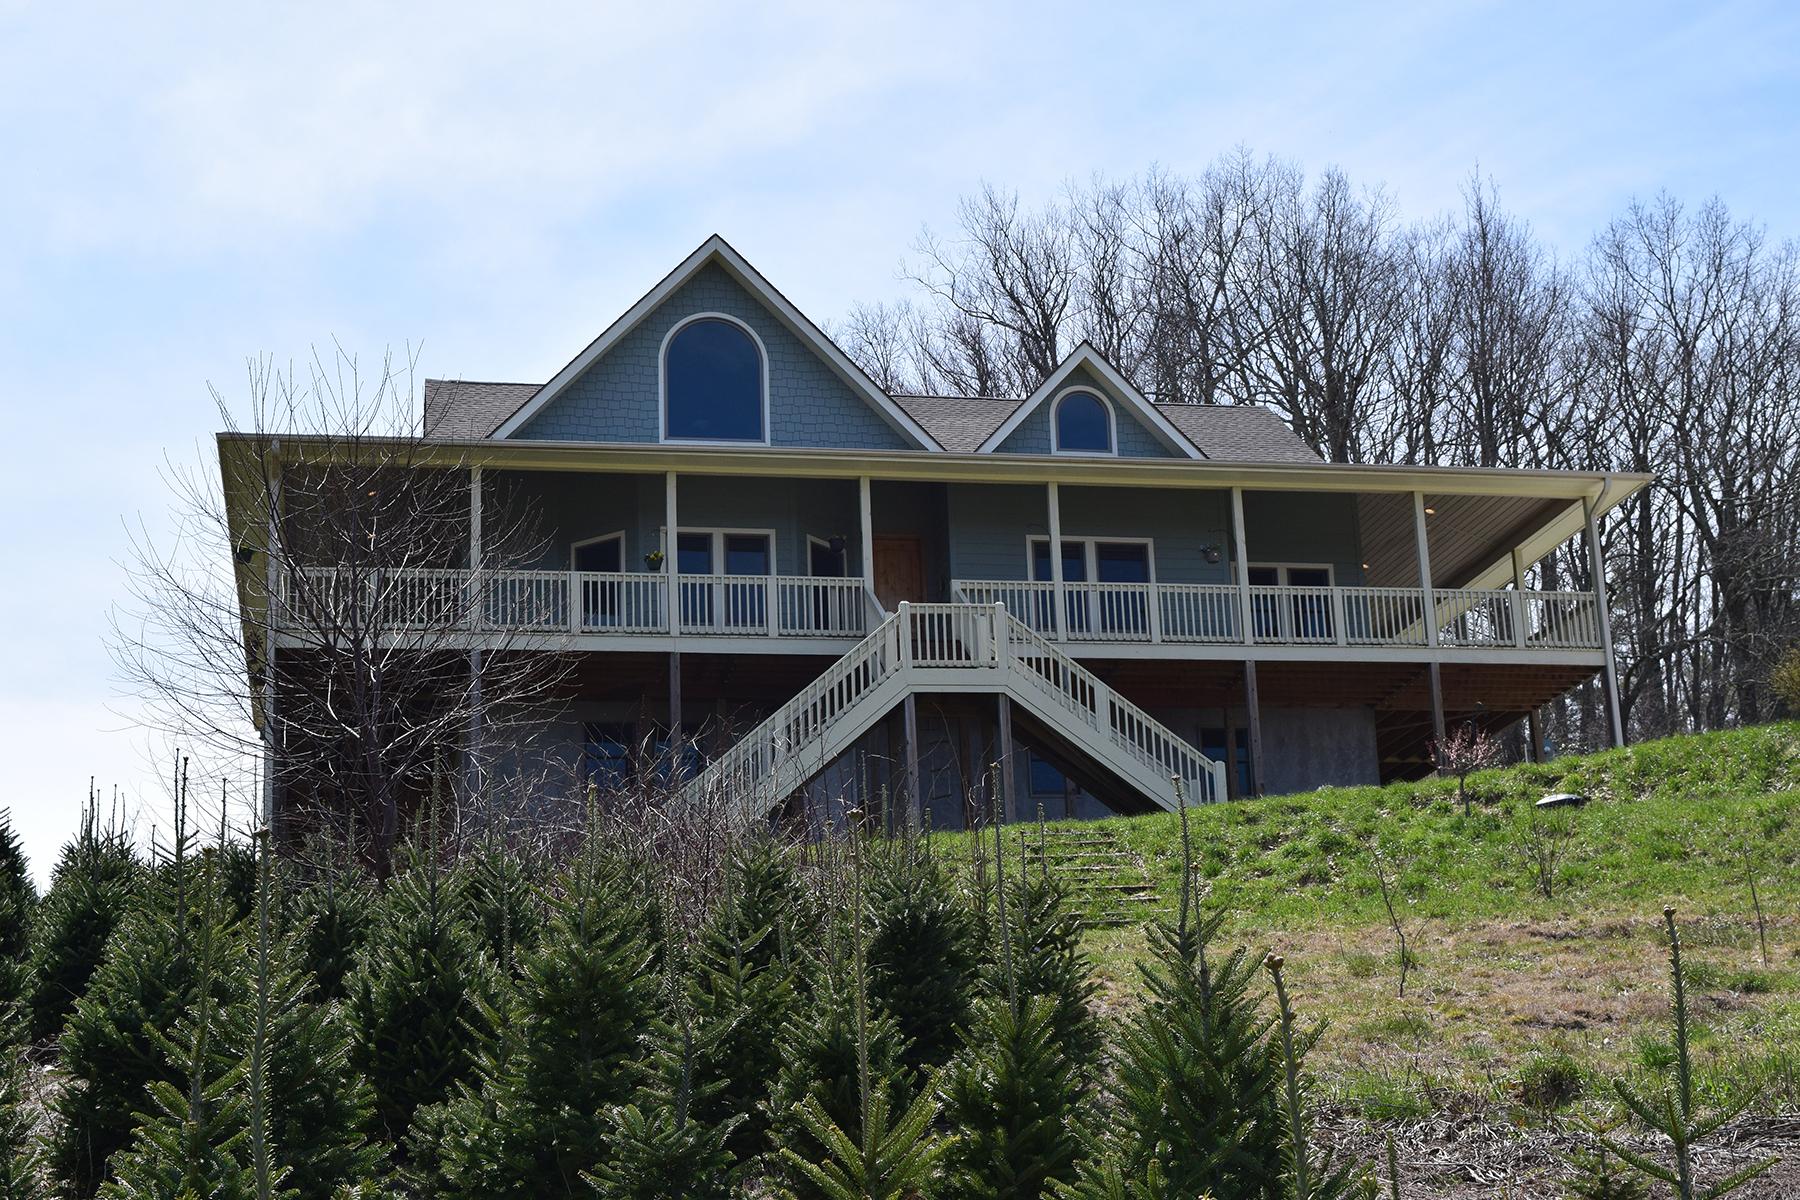 Single Family Home for Sale at Newland 194 Damon Vance Lane Newland, North Carolina, 28657 United States